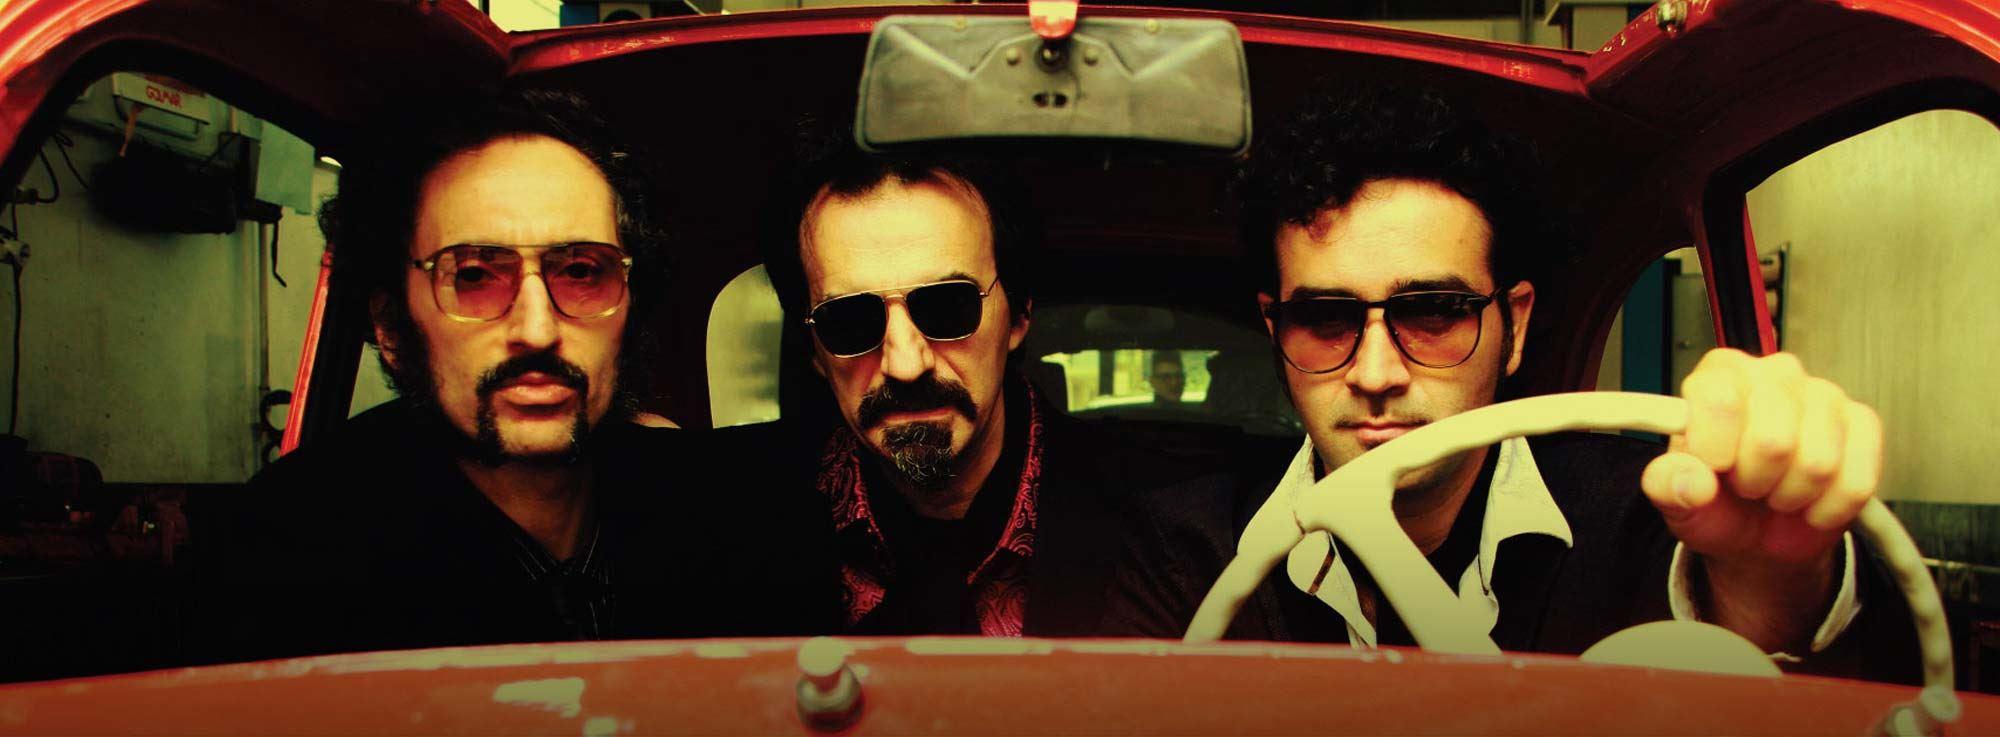 Fasano: The Bumps with Giò Sada e Gianluca Petrella Live